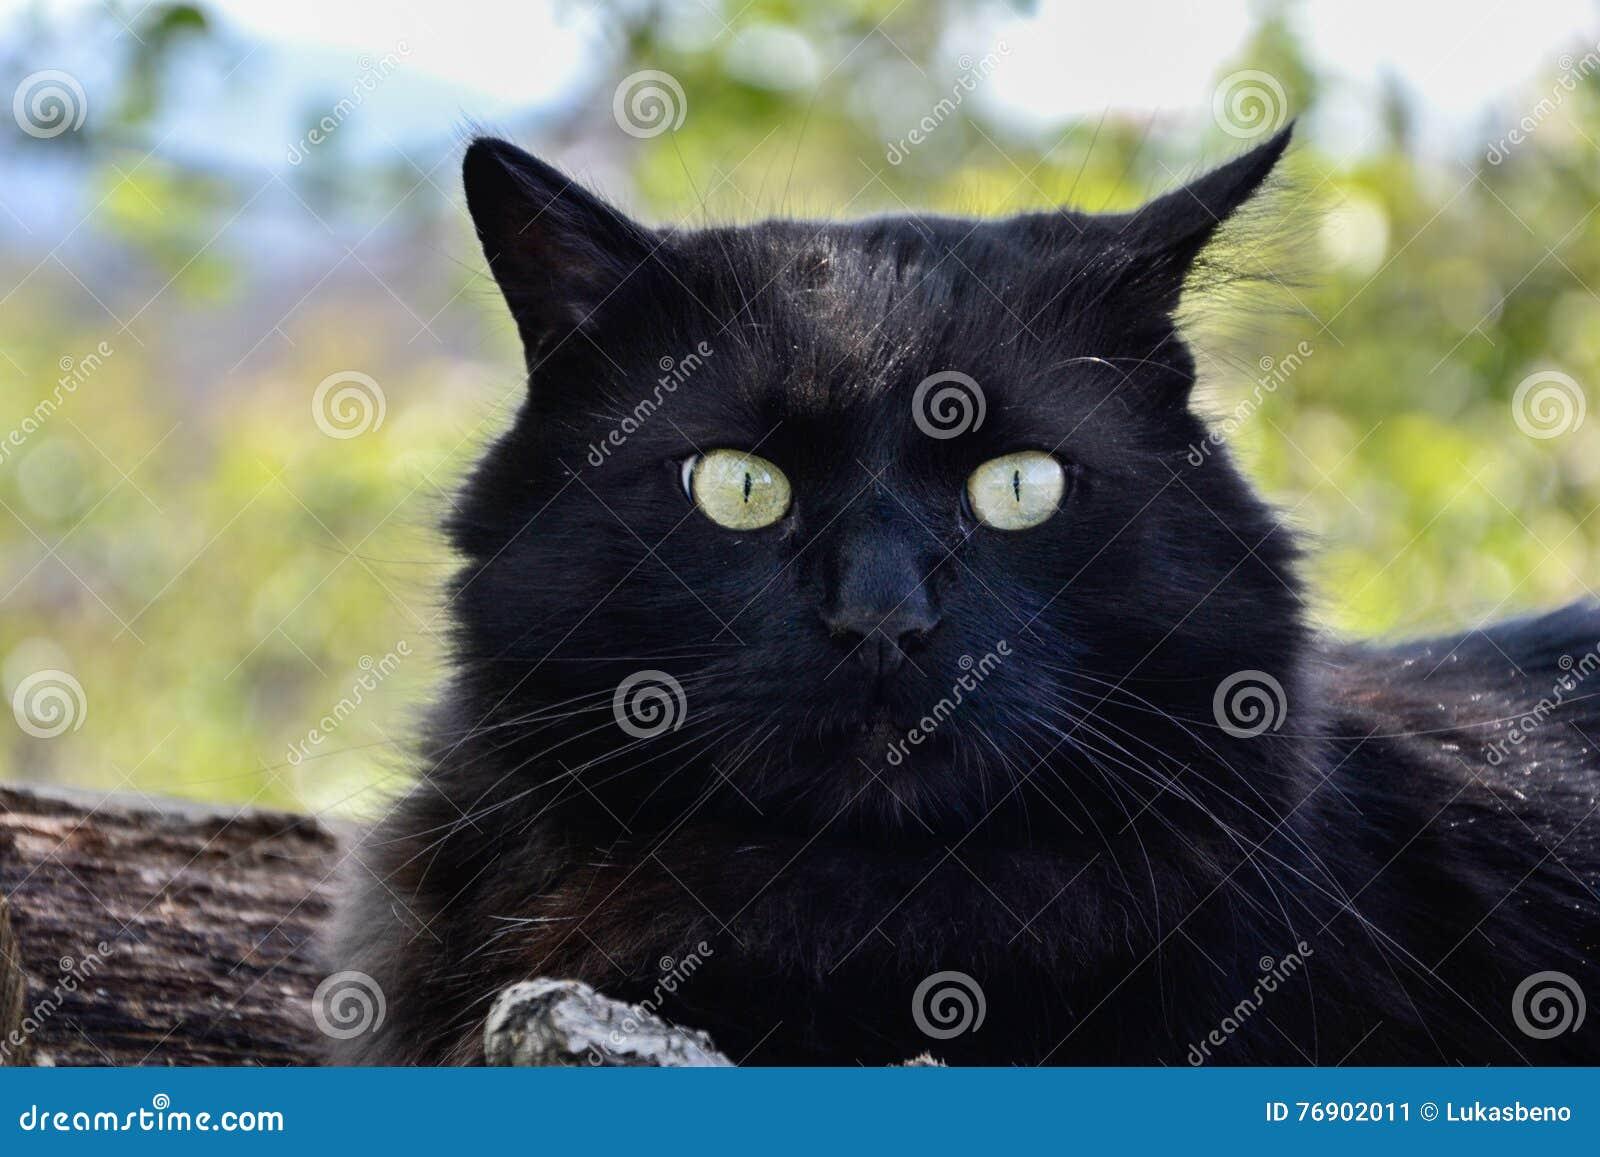 Fat Cat With Big Eyes Cartoon